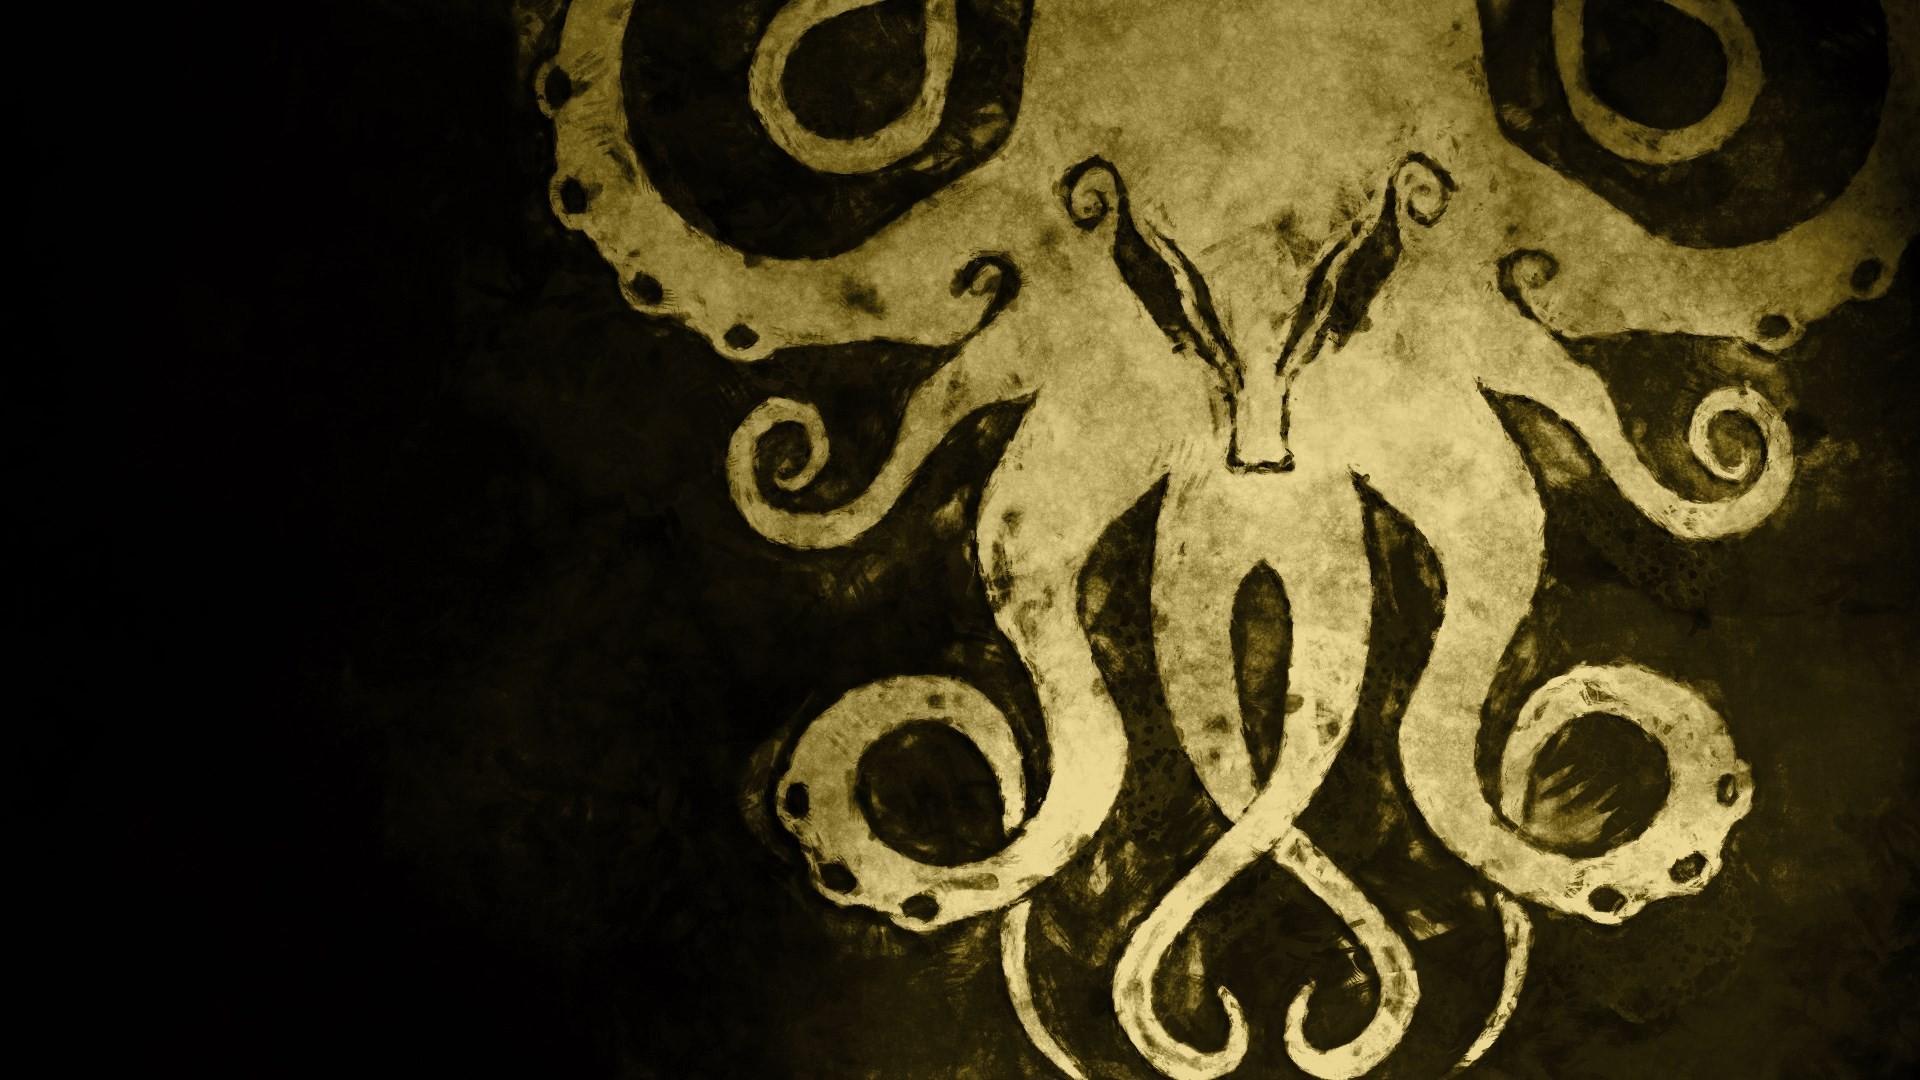 General 1920x1080 Cthulhu Cthulu dark background H. P. Lovecraft horror artwork tentacles